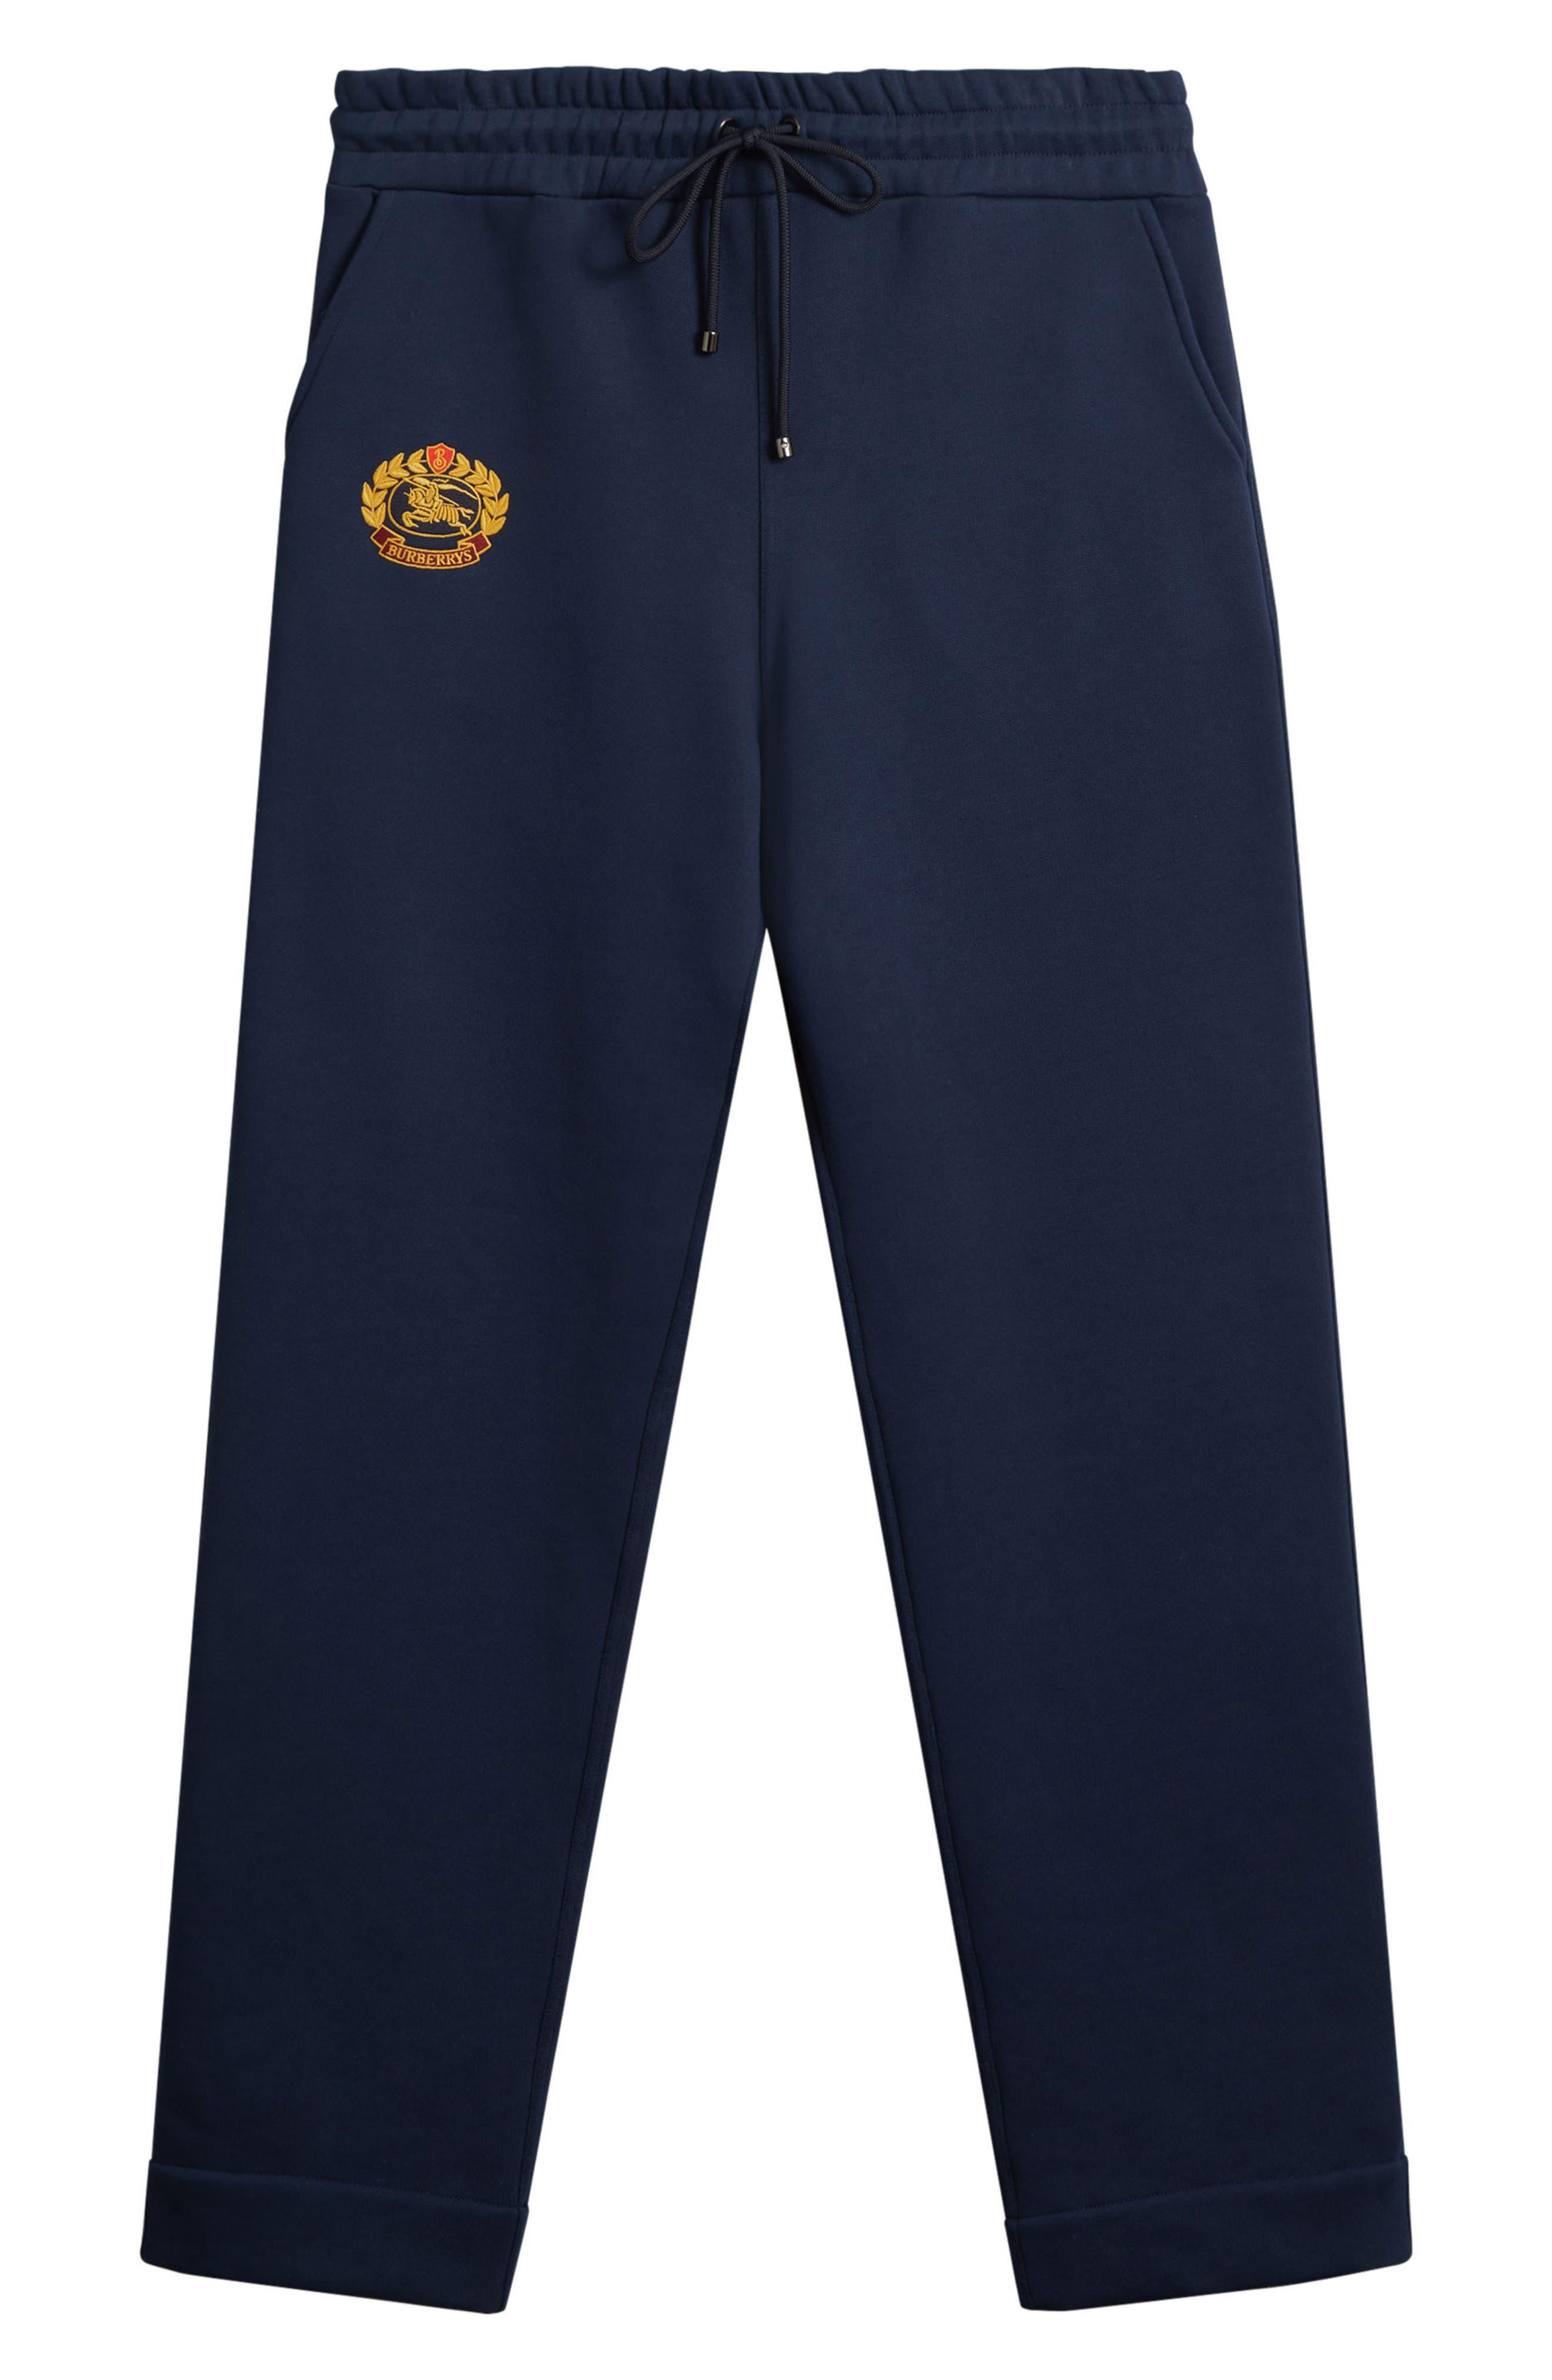 Vintage Crest Sweatpants,                             Alternate thumbnail 4, color,                             MIDNIGHT BLUE